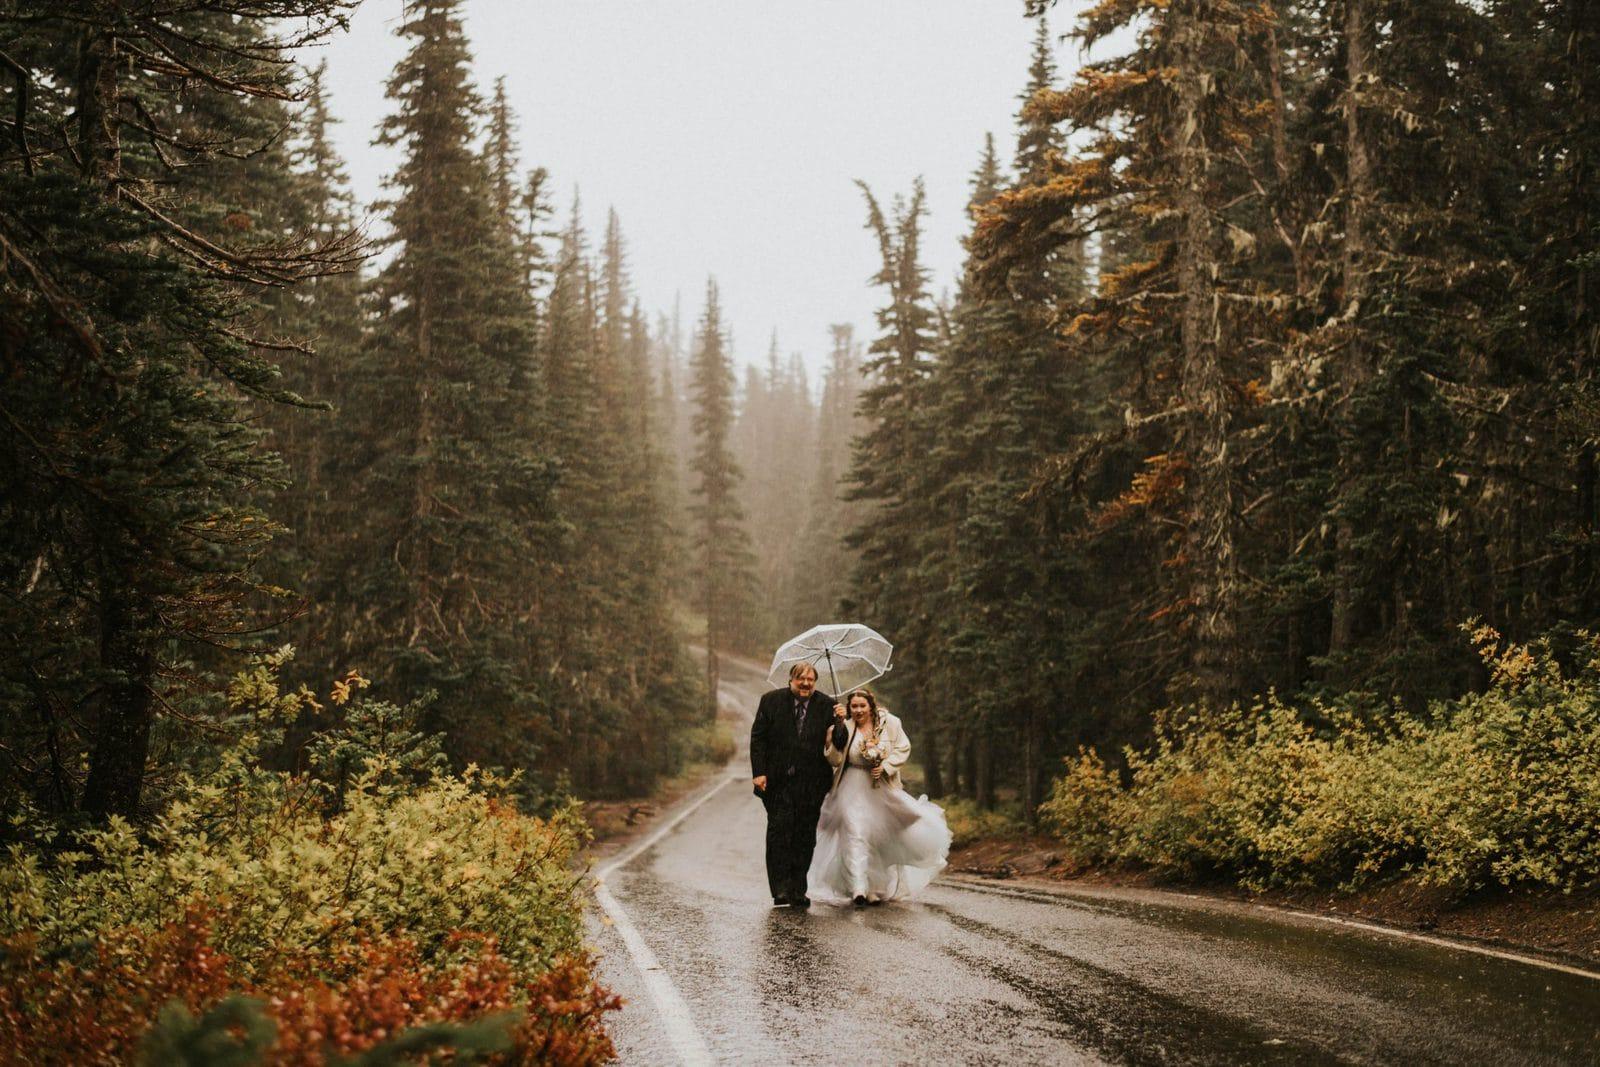 Dad walking bride down to ceremony spot